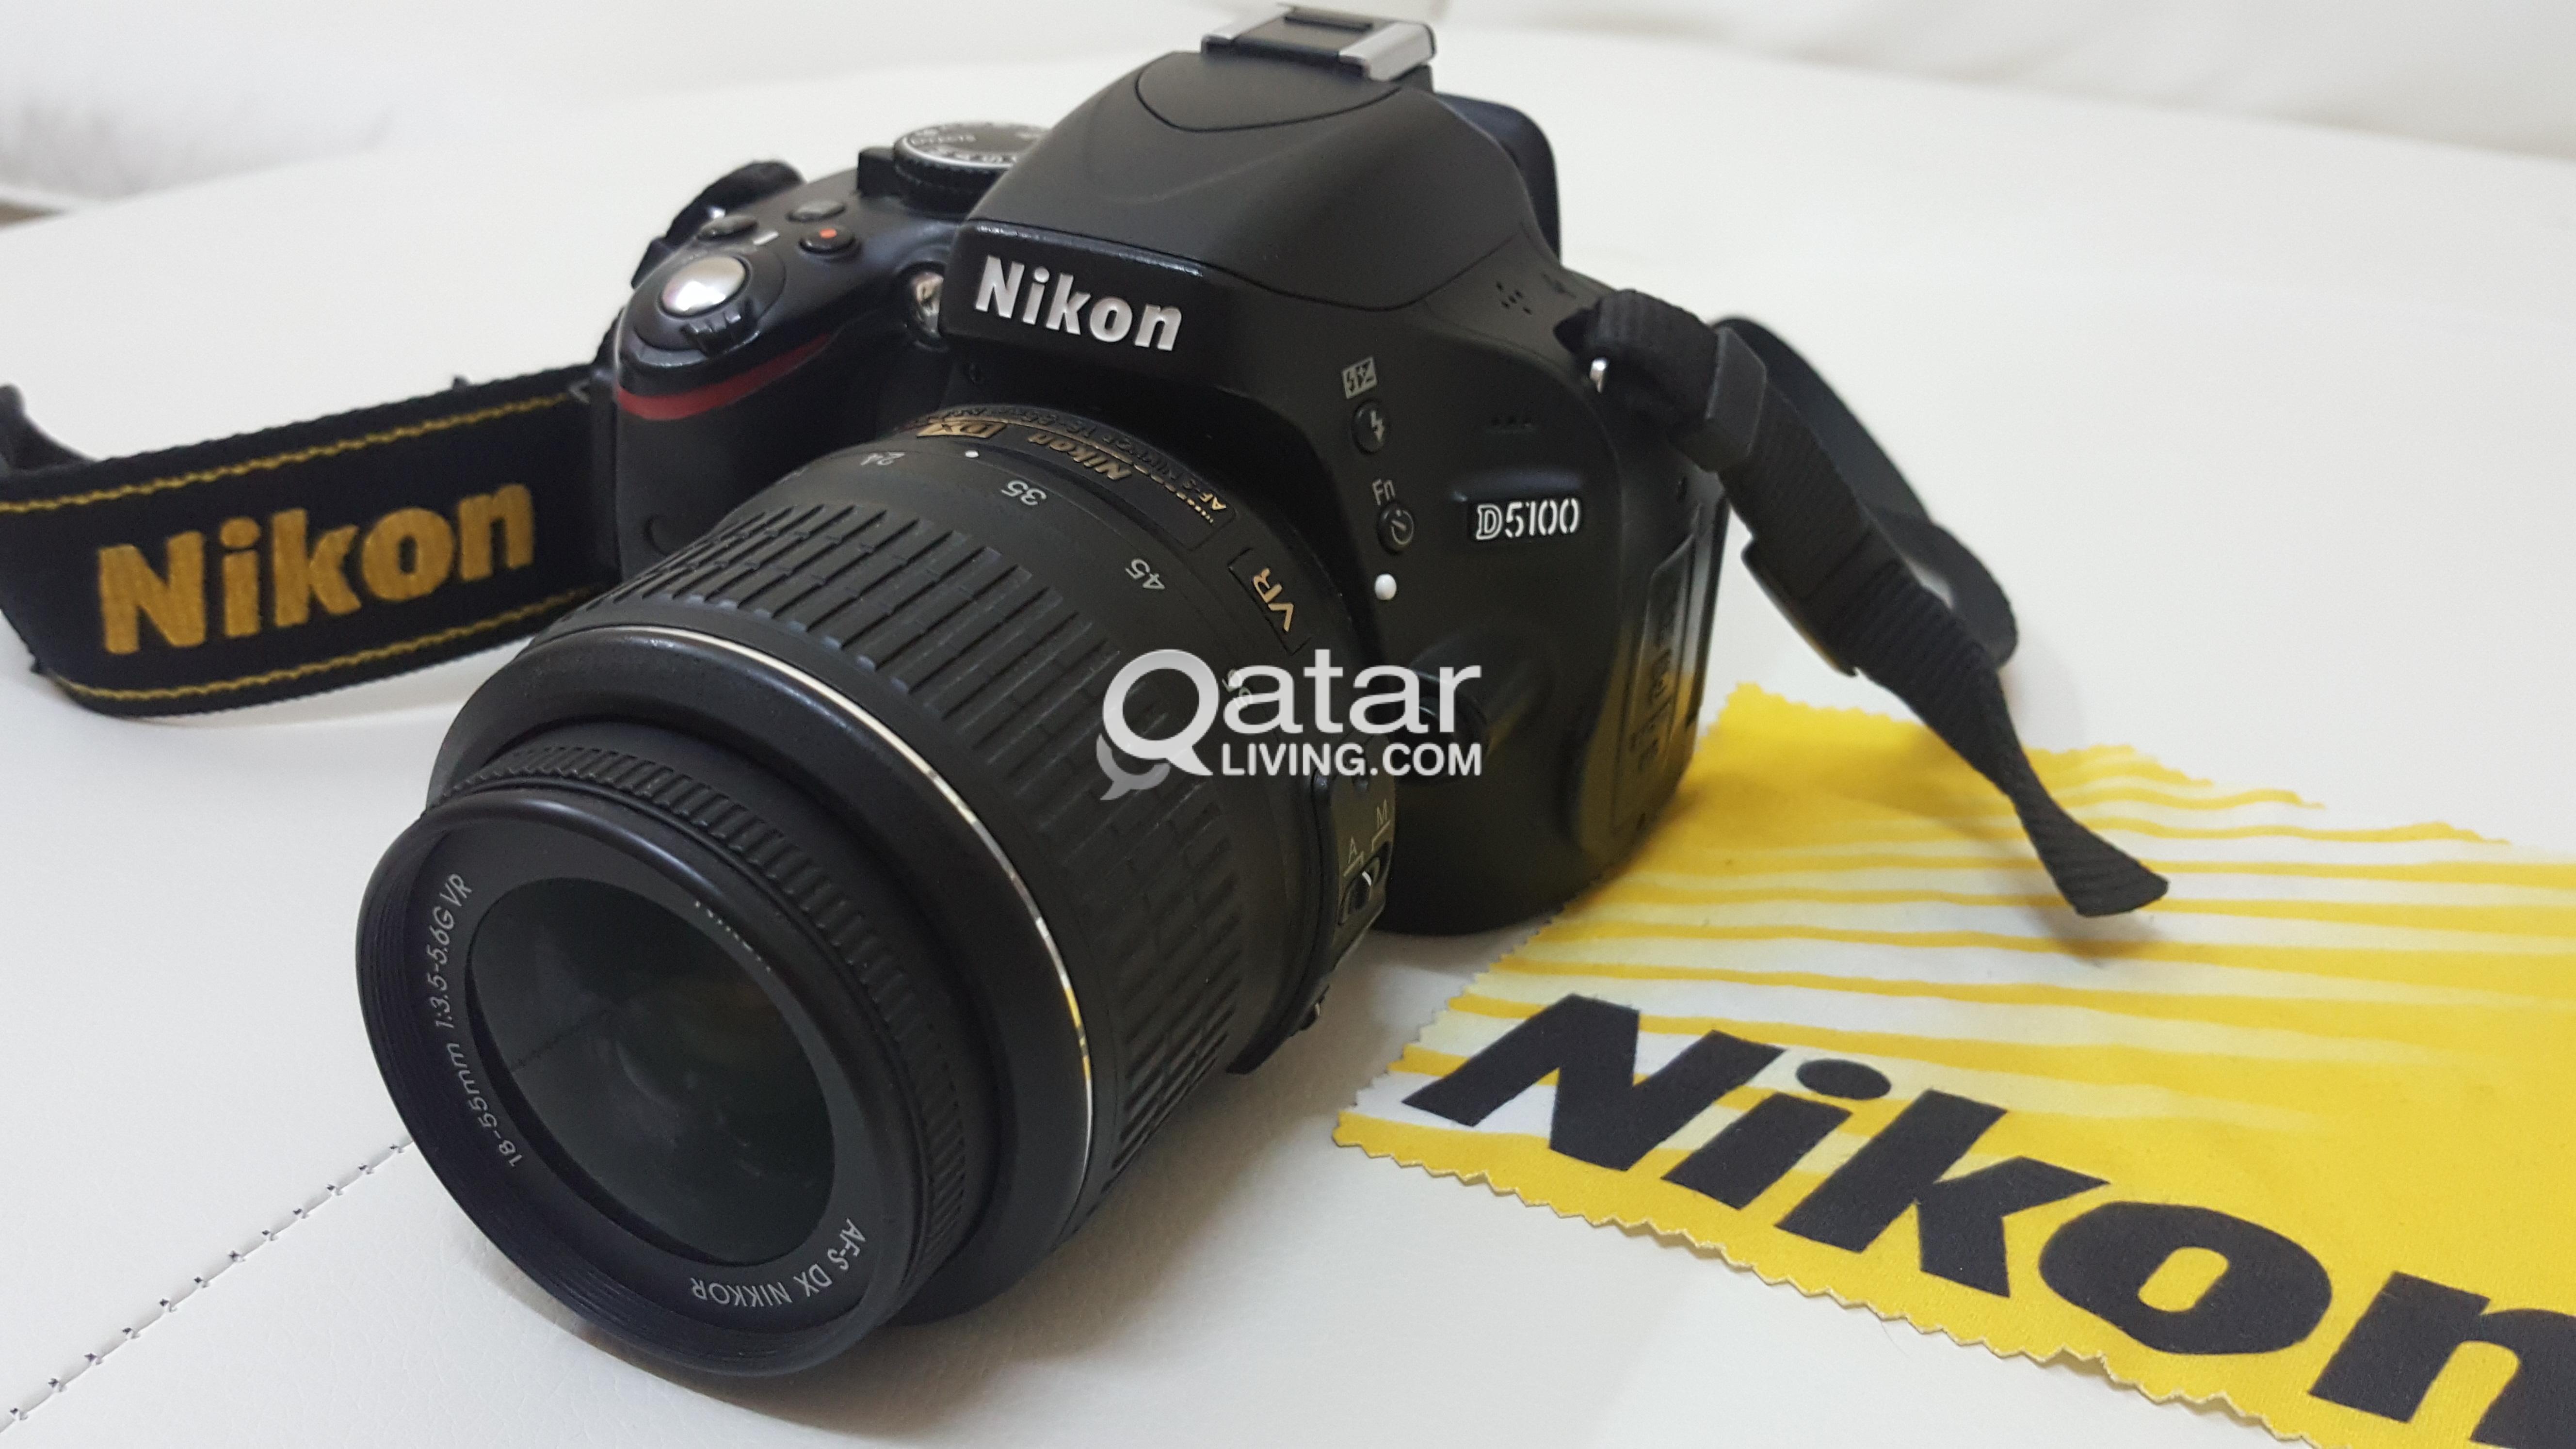 Nikon D5100 Dslr professional camera | Qatar Living